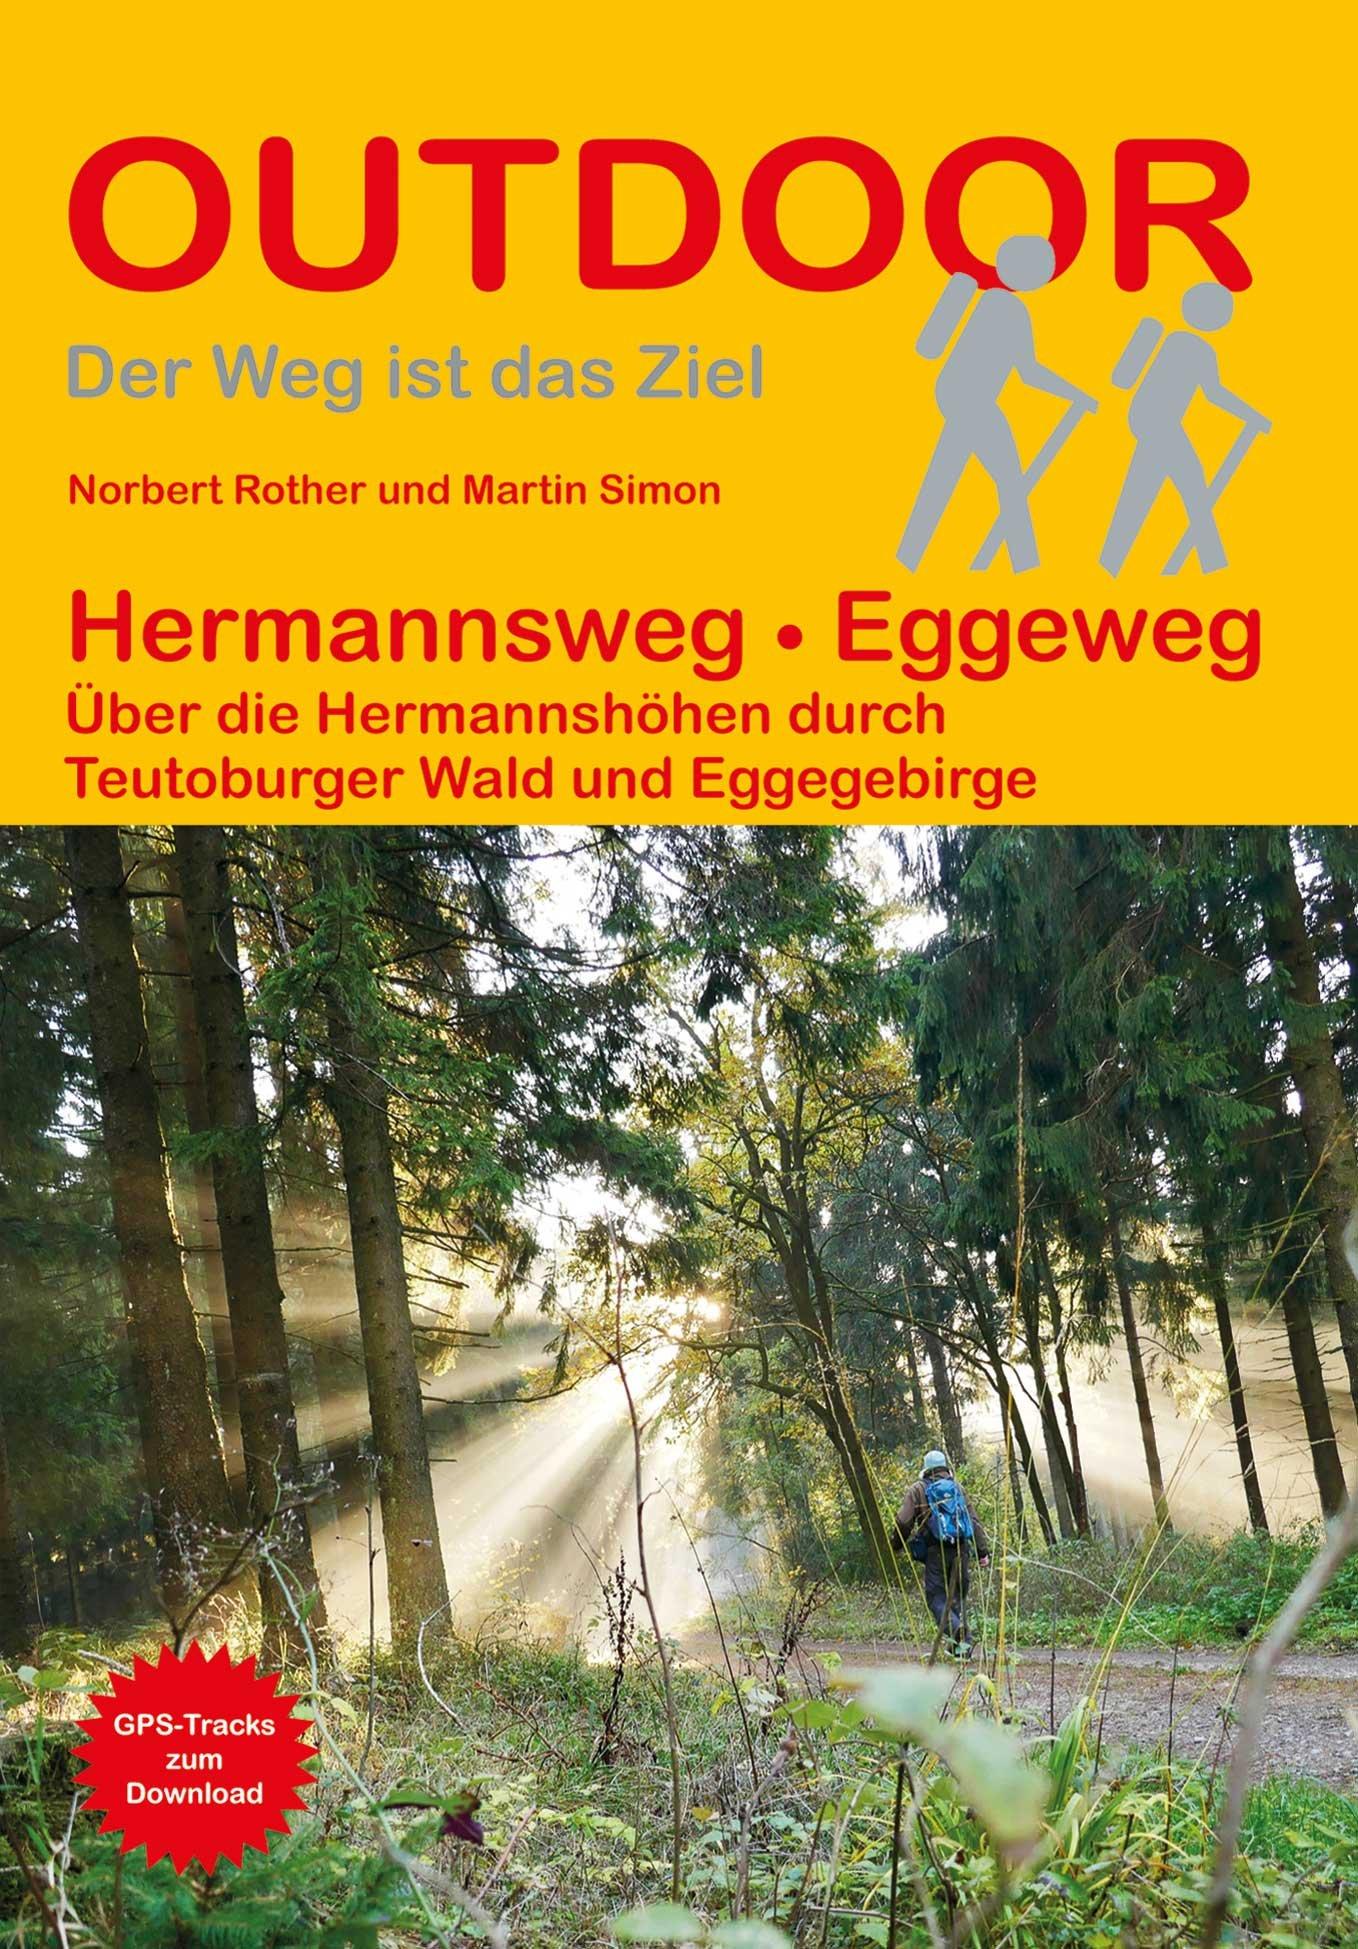 Hermannsweg - Eggeweg | wandelgids (Duitstalig) 9783866866218  Conrad Stein Verlag Outdoor - Der Weg ist das Ziel  Meerdaagse wandelroutes, Wandelgidsen Sauerland, Münsterland, Teutoburger Wald